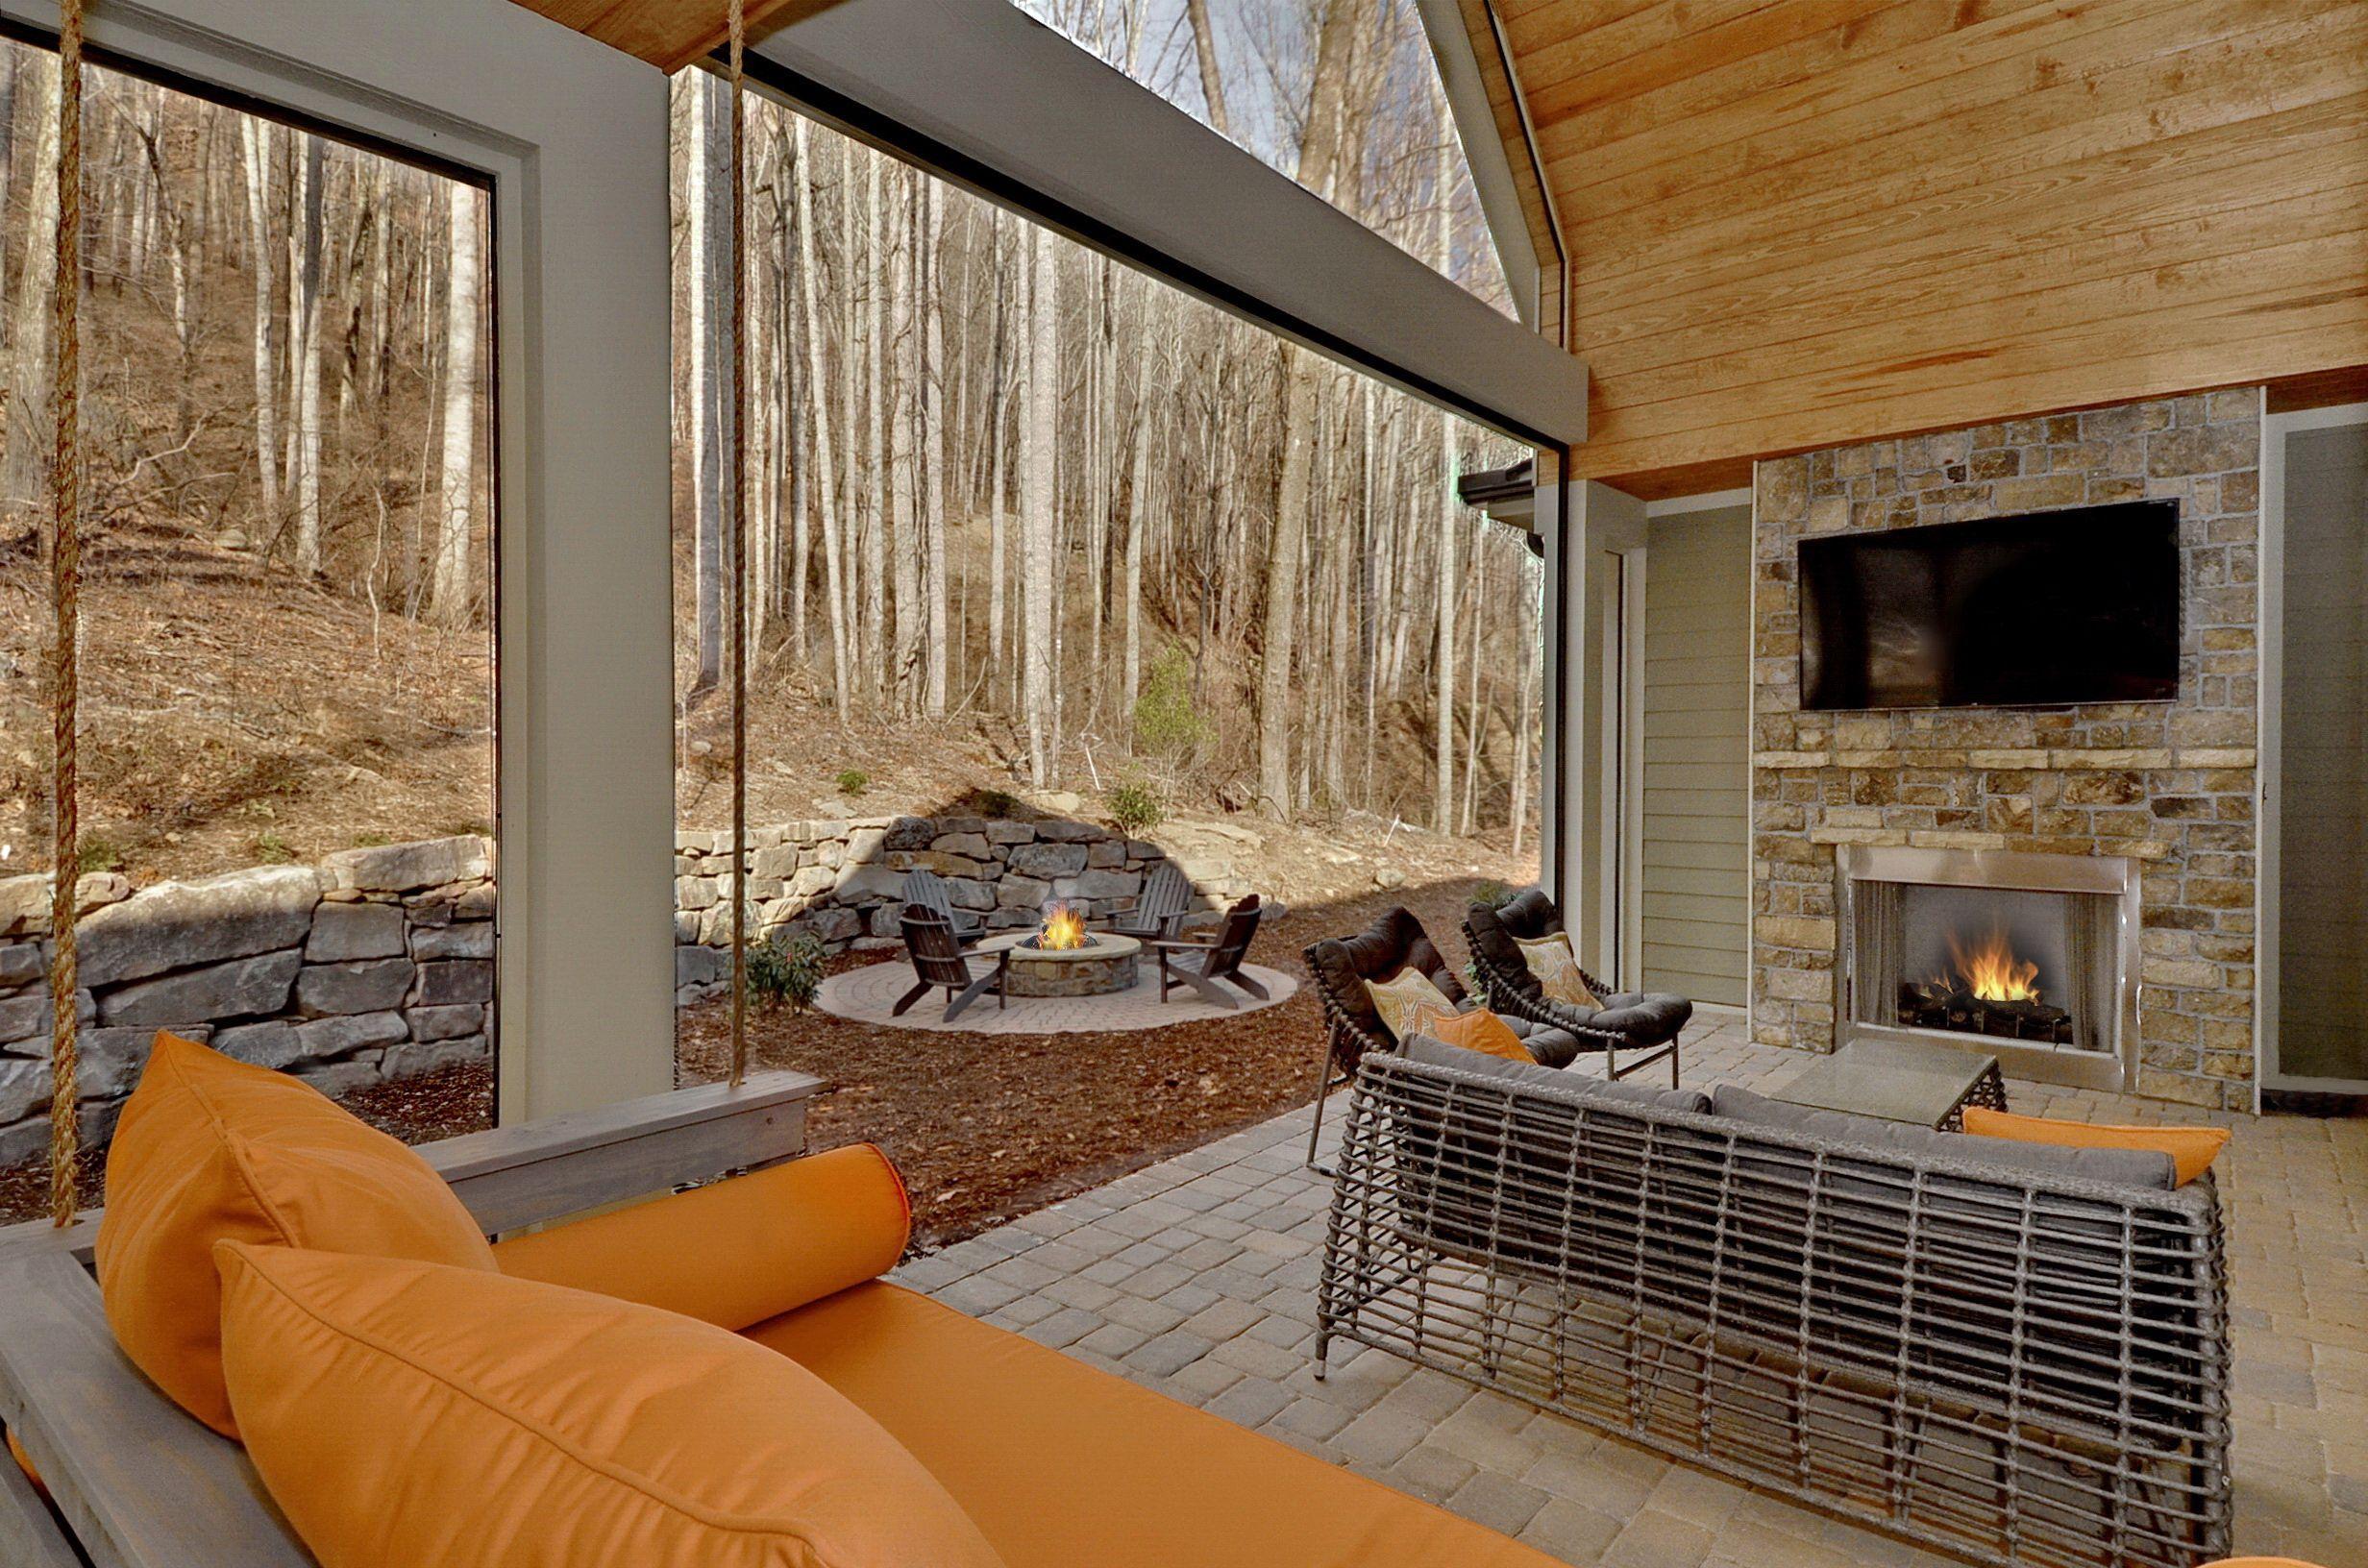 Outdoor Living Custom fireplace, Arthur rutenberg homes